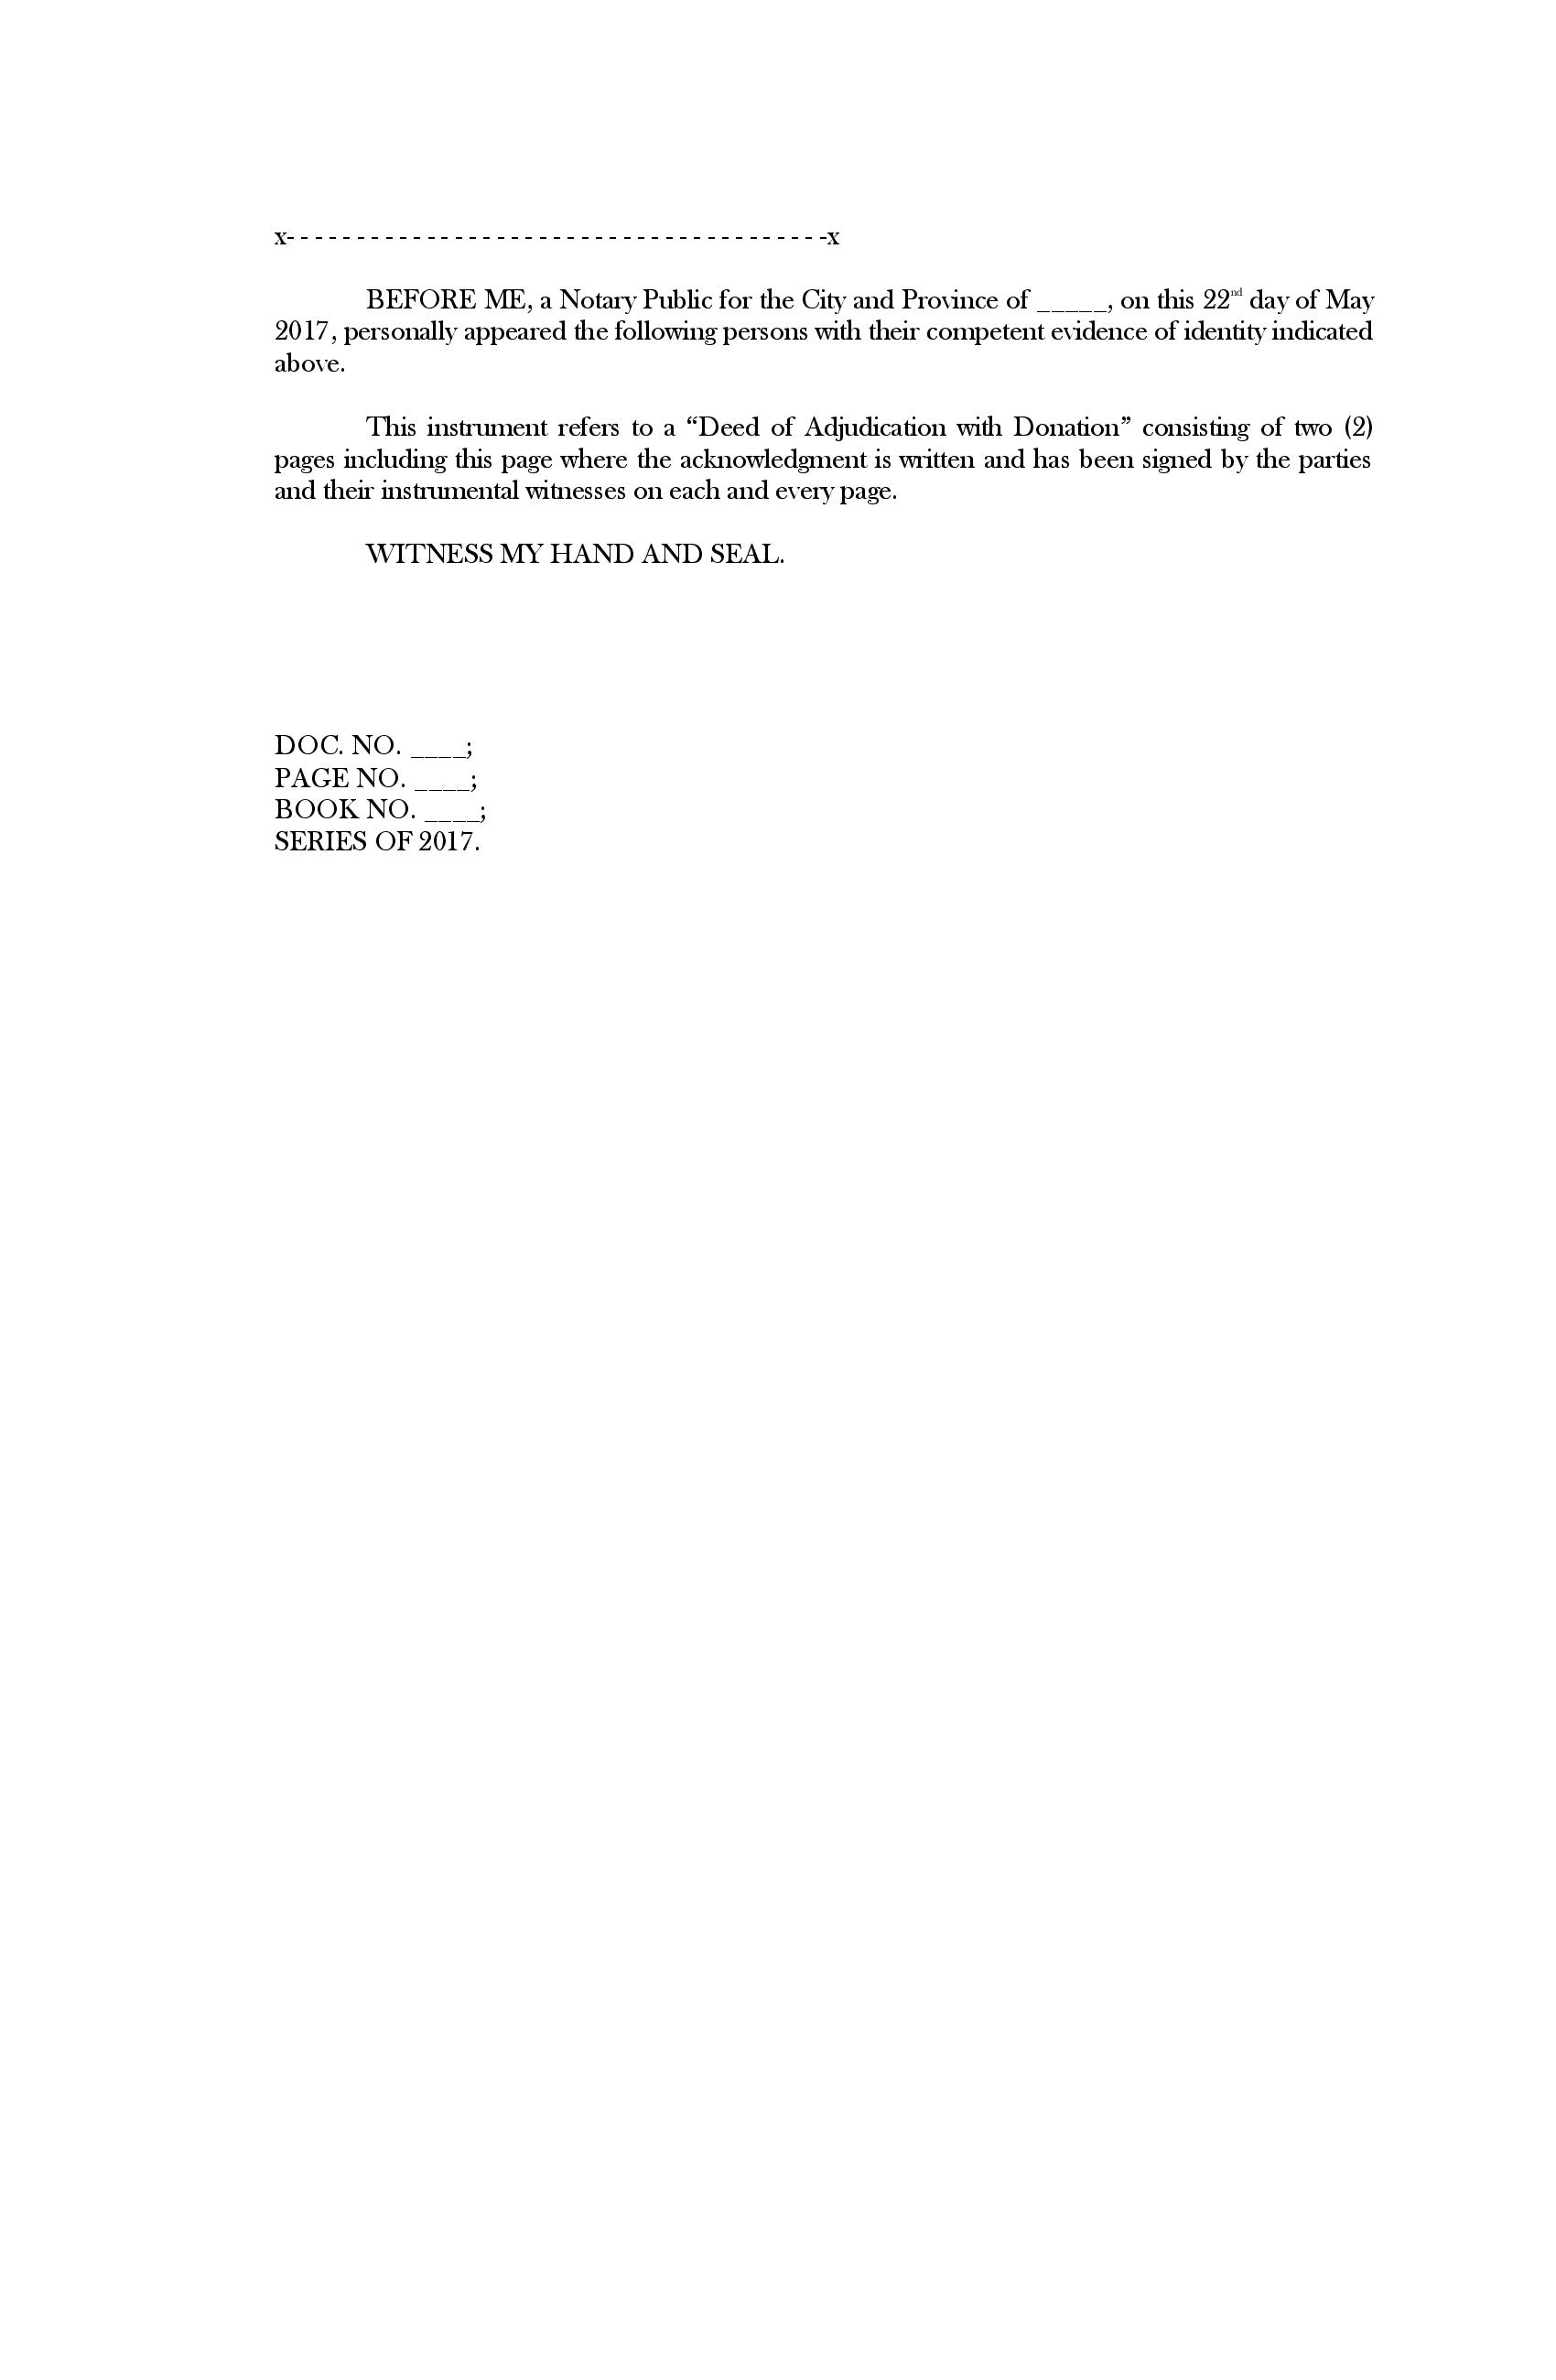 Deed of Adjudication page two